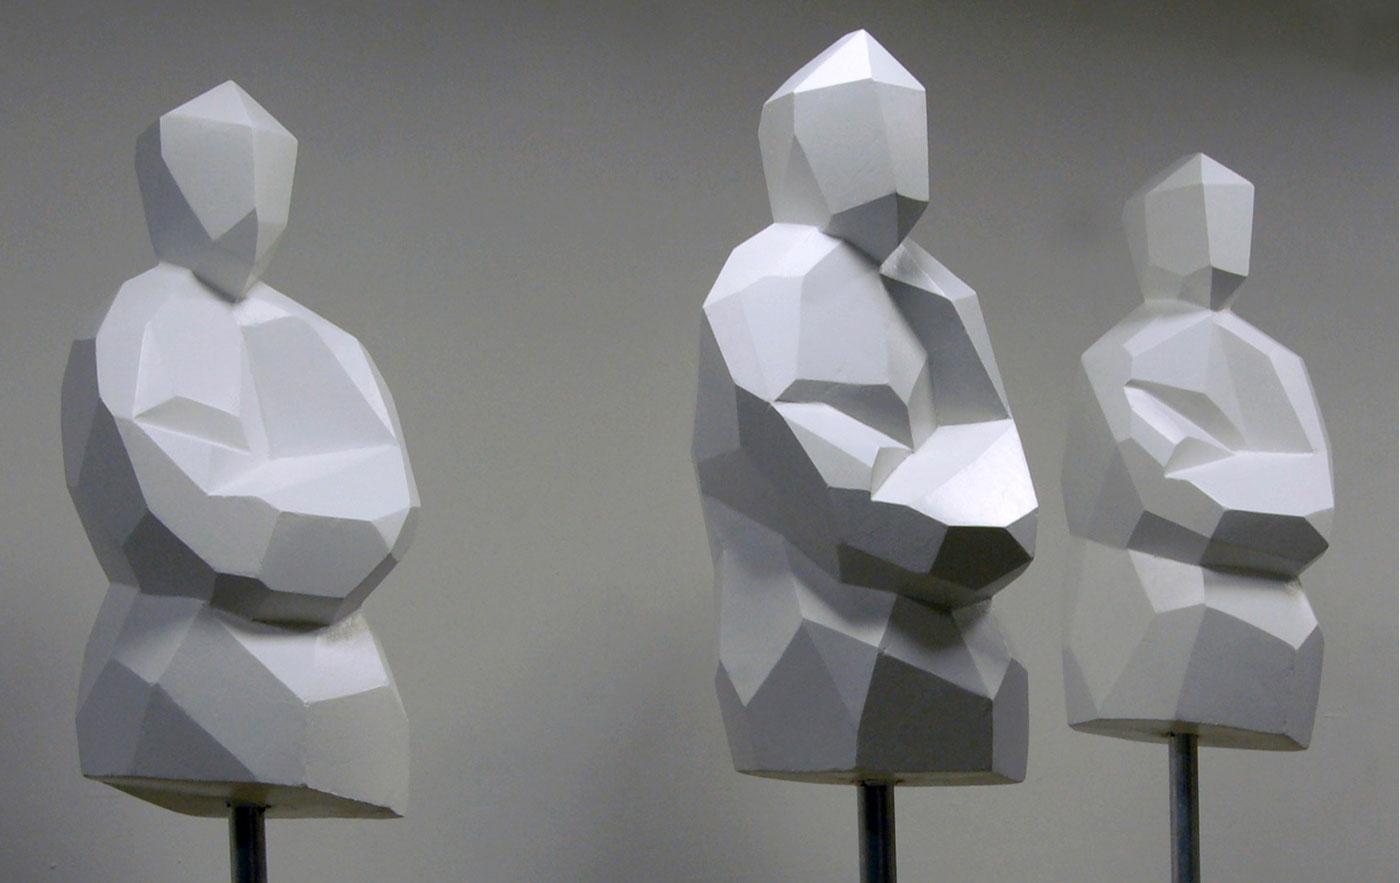 3 TORSI, © 2009, styrofoam, dispersion surface, paint, steel, each 100 x 50 x 50 cm